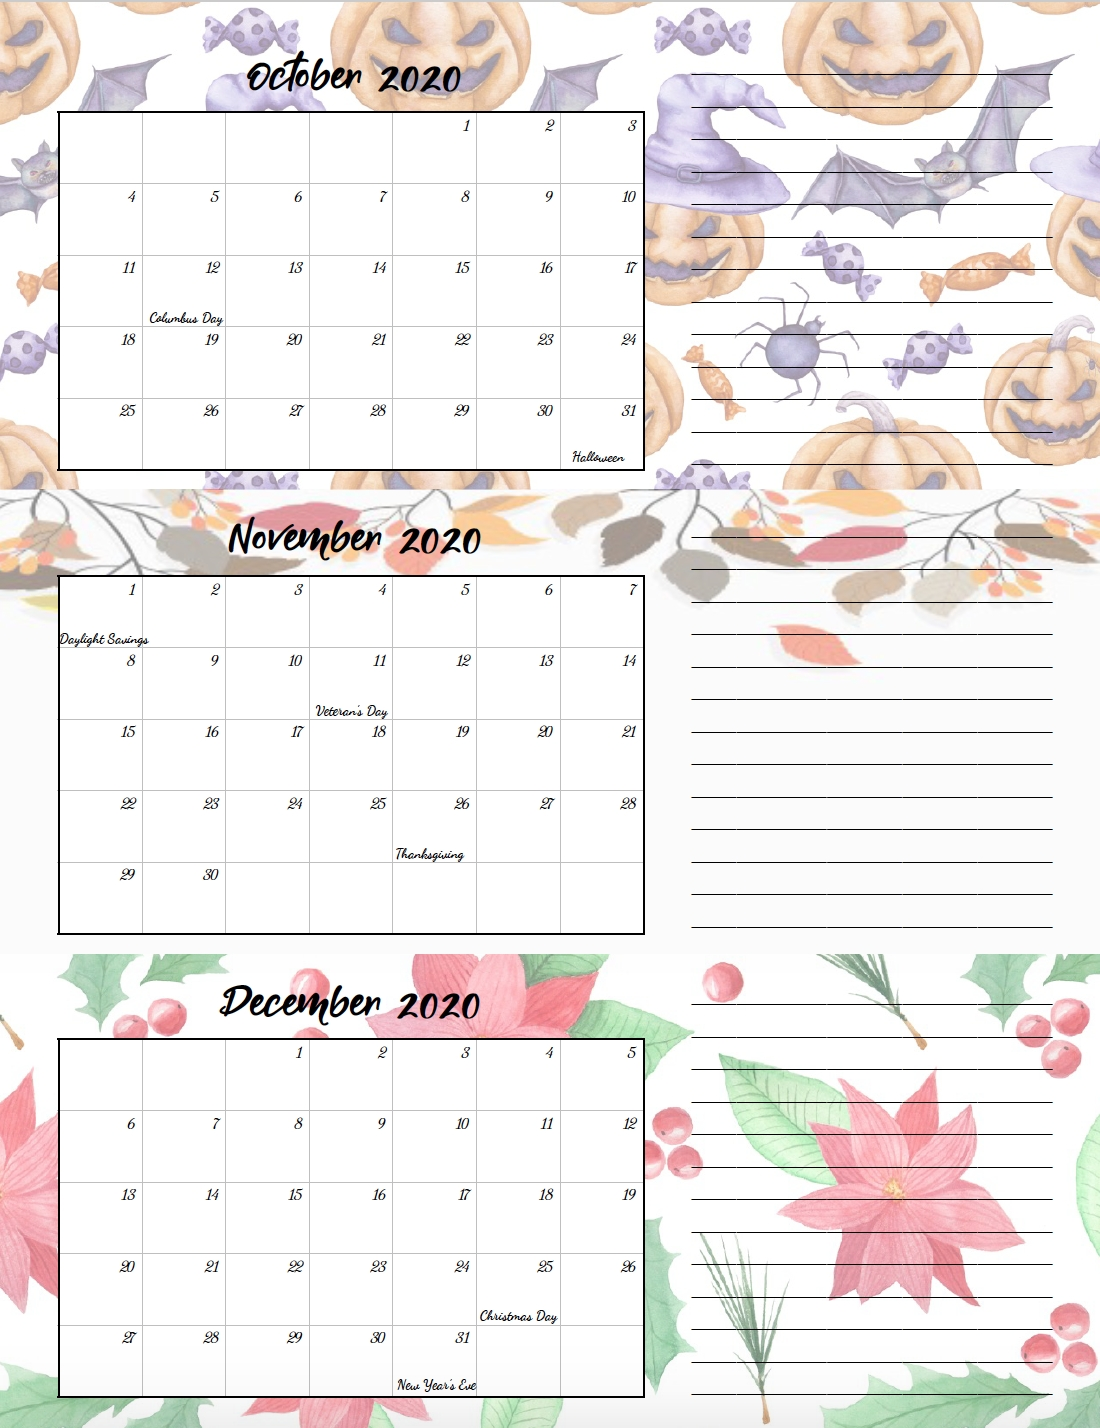 Free Printable 2020 Quarterly Calendars With Holidays: 3 regarding Free Printable Calander 2020 Victoria Wiht Spaces To Write